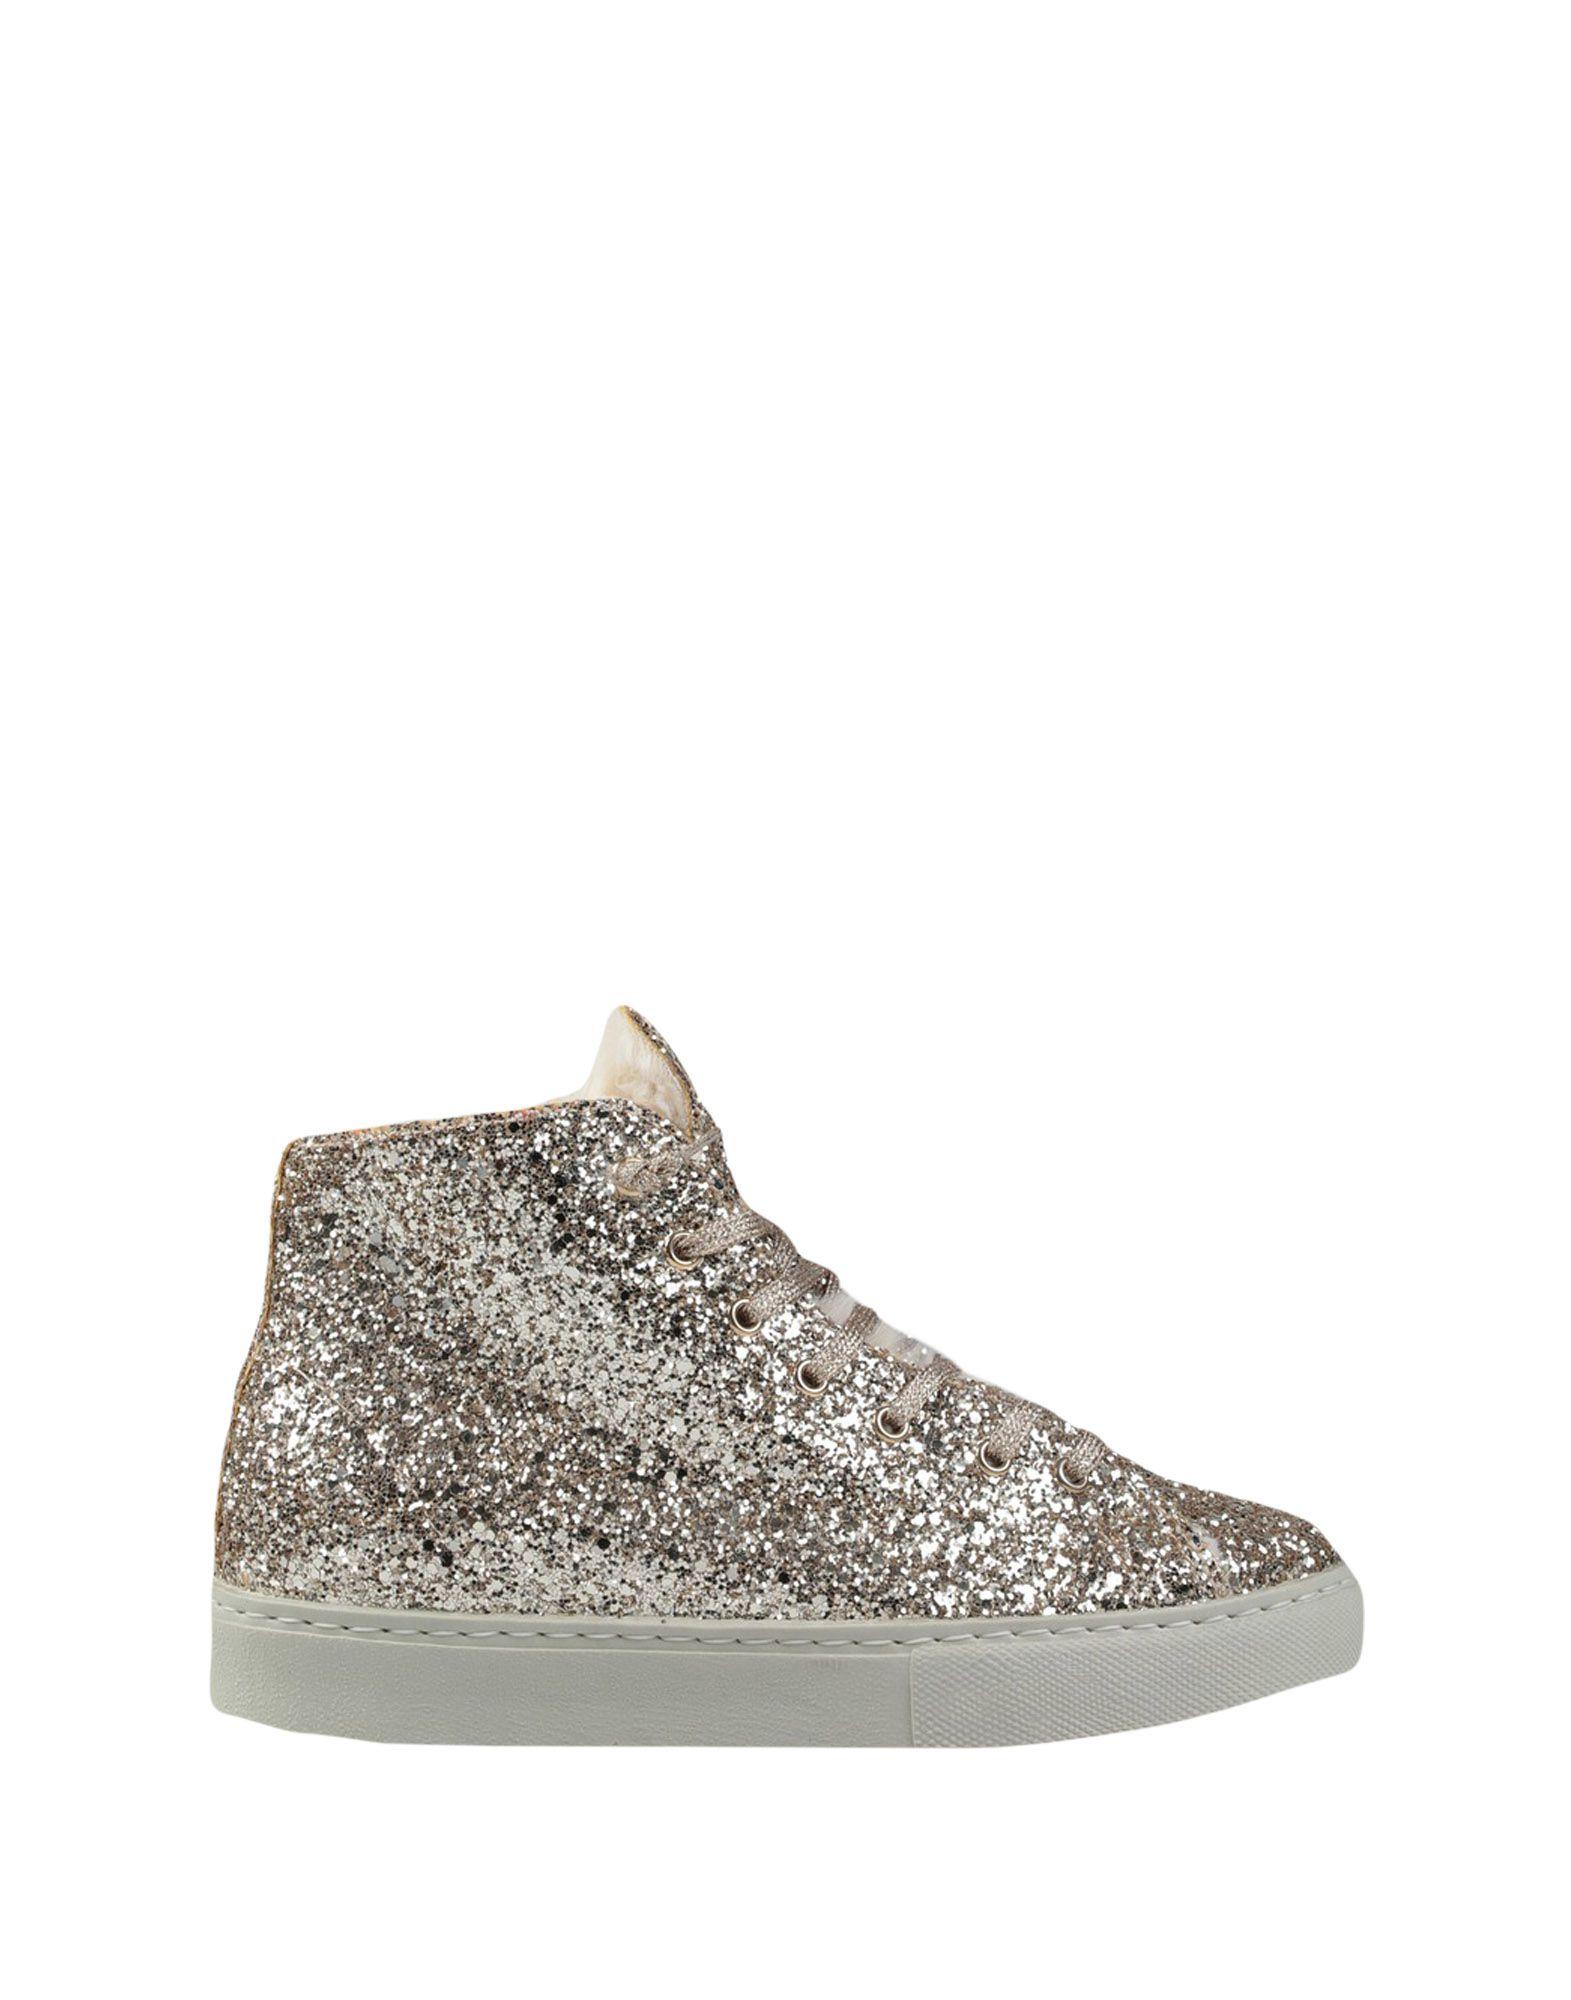 Rabatt Schuhe Chiara Ferragni  Sneakers Damen  Ferragni 11552083PC 9981a1